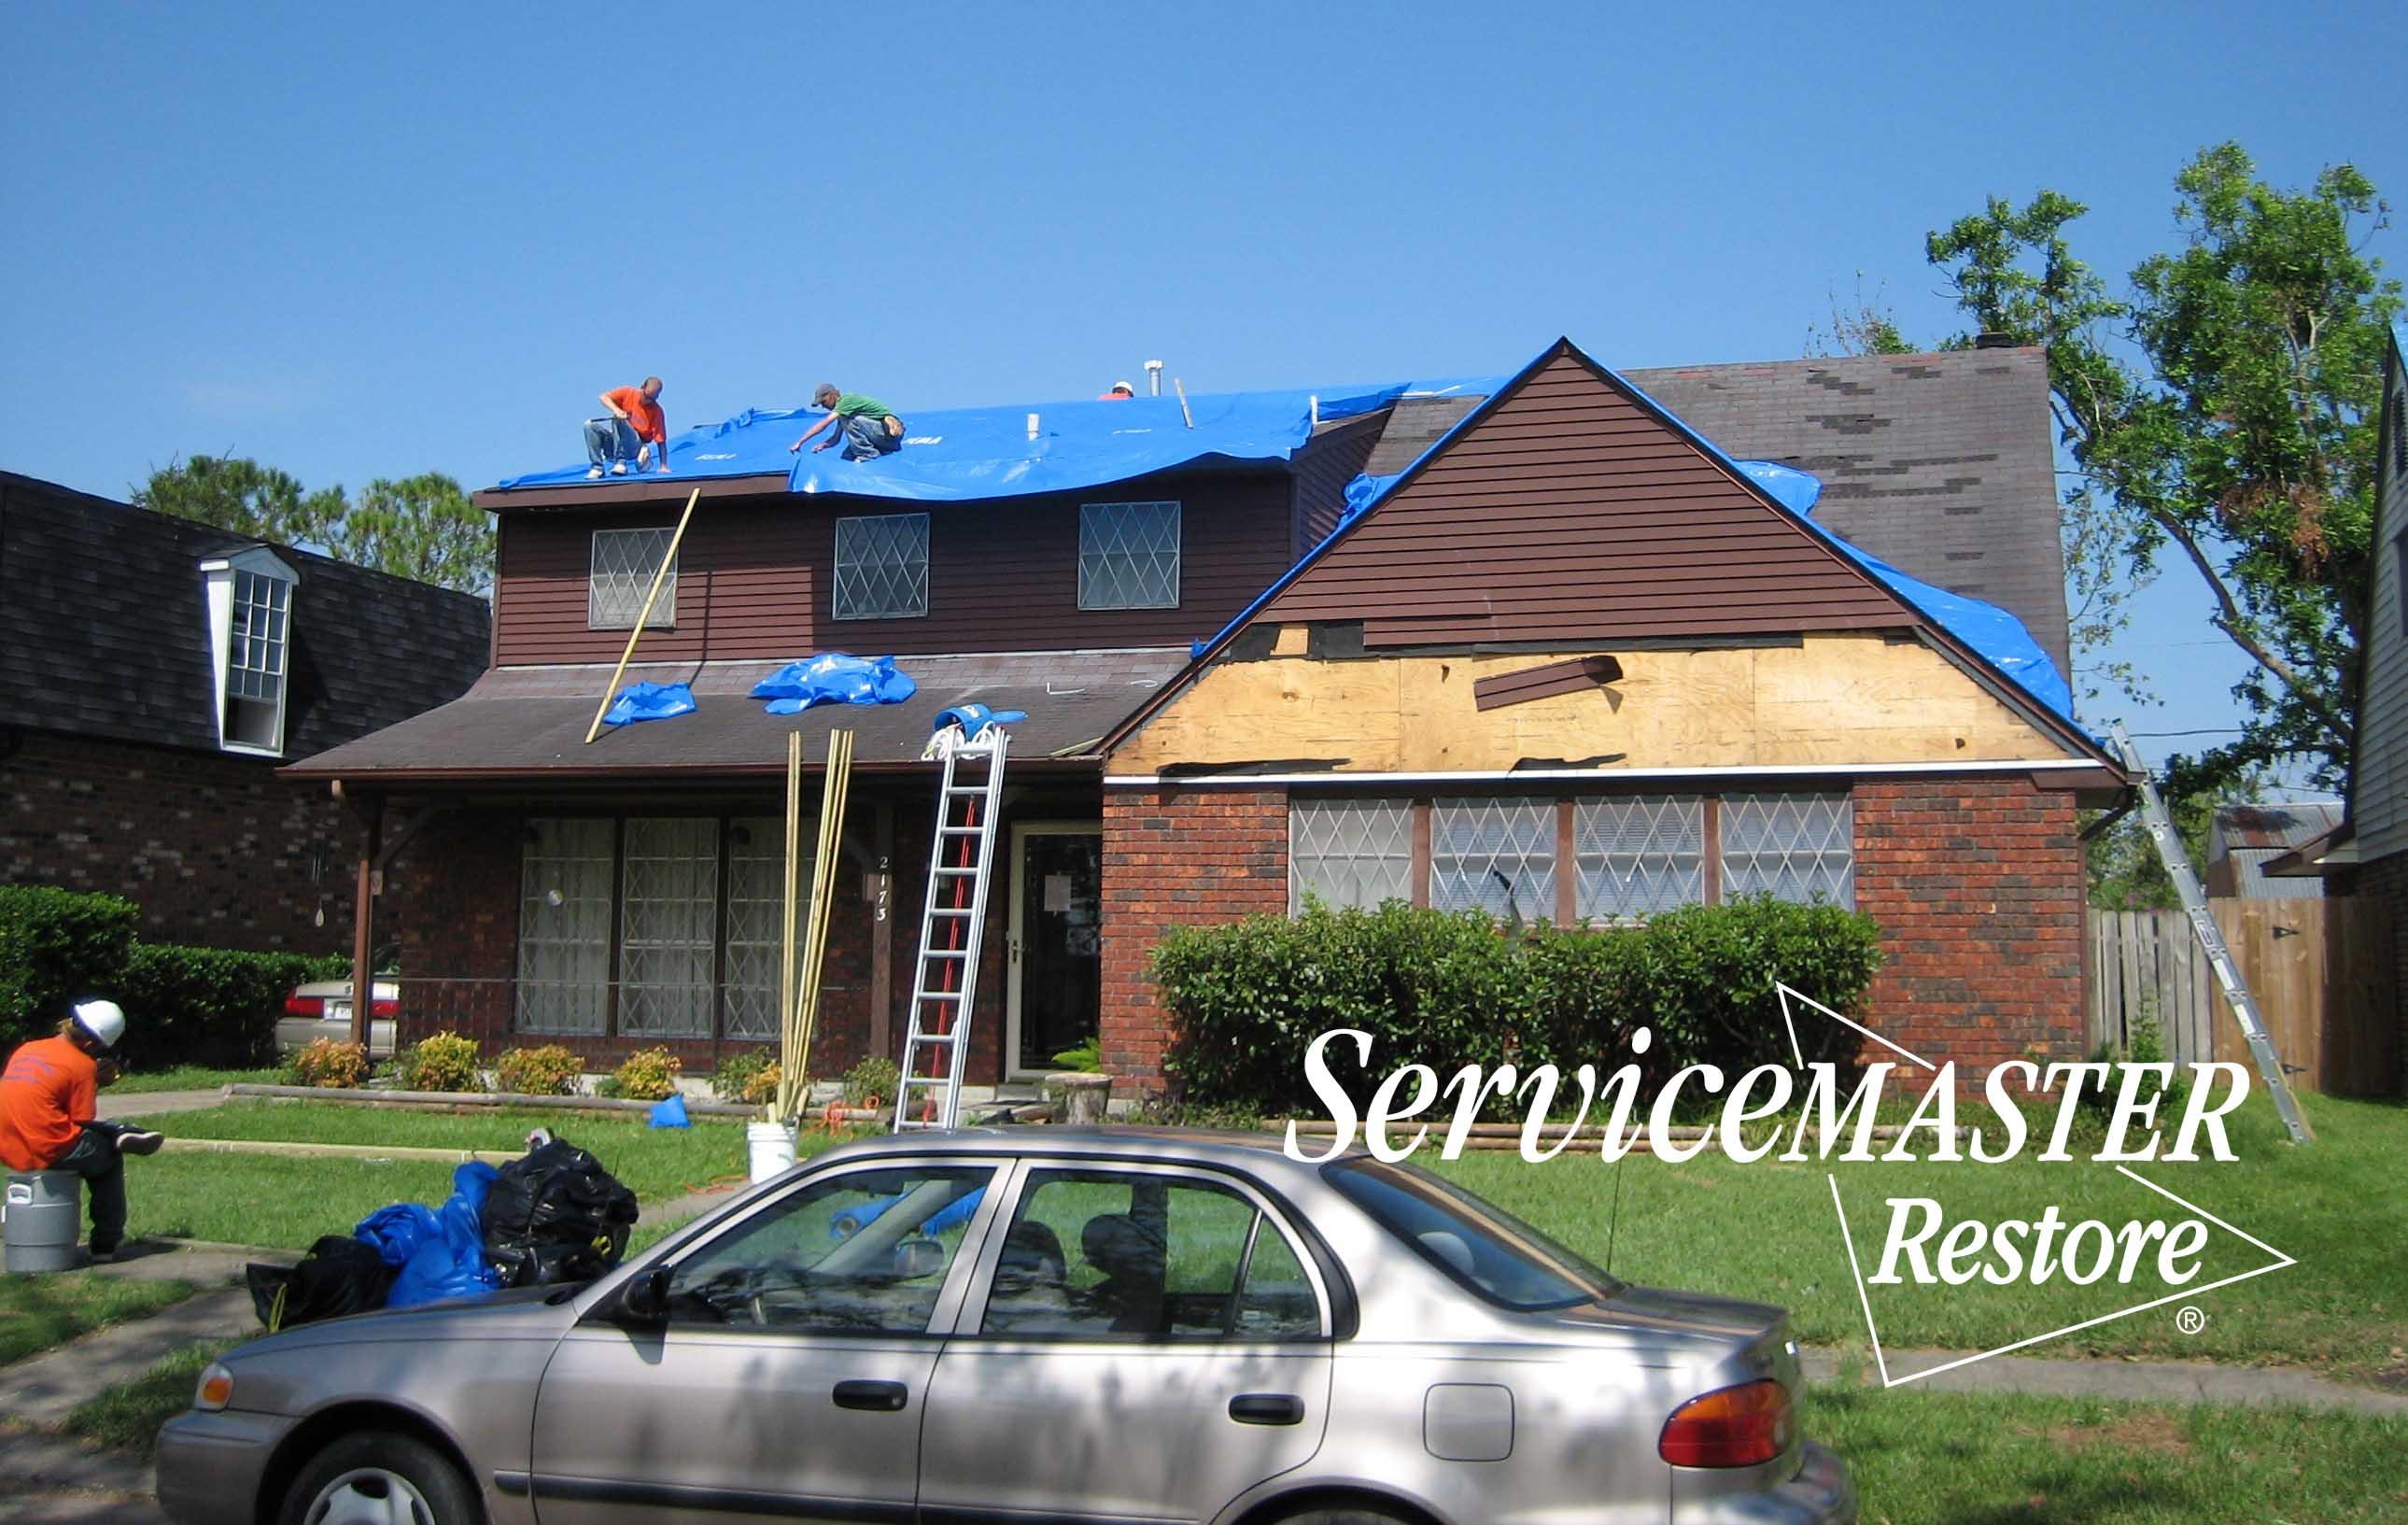 Tornado Damage Restoration in Bee Lick, KY